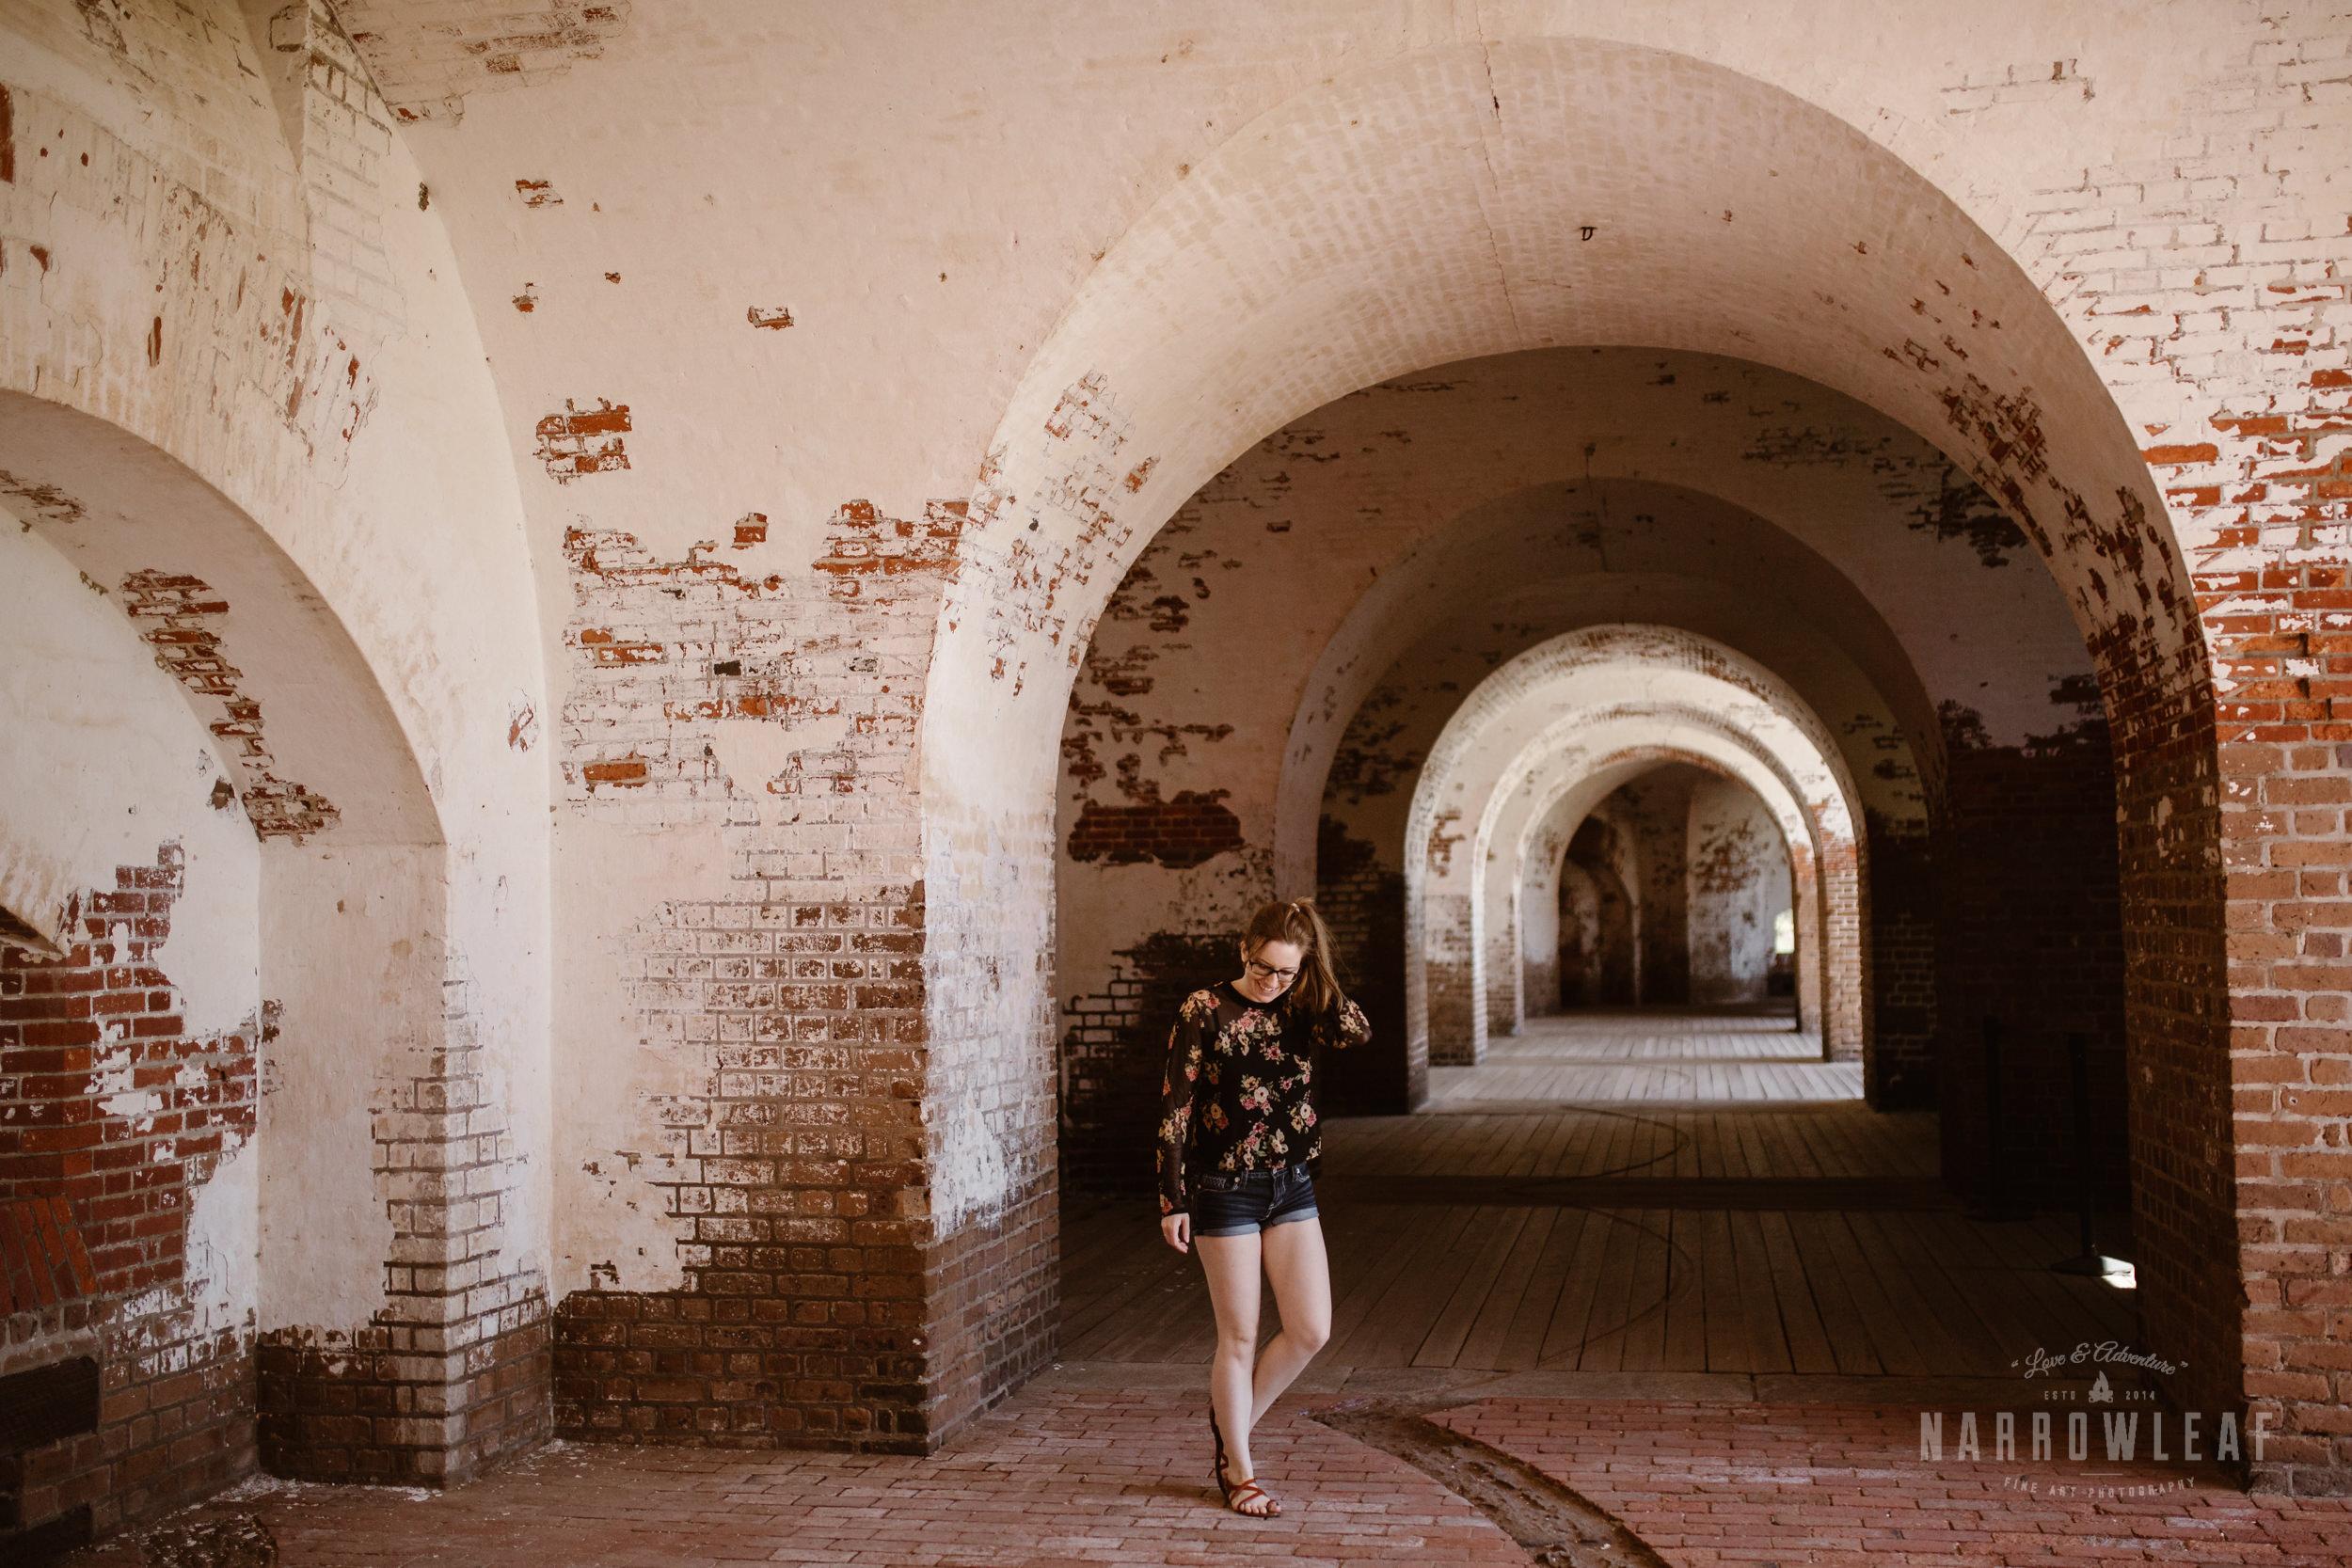 Fort-Pulaski-National-Monument-Narrowleaf_Love_and_Adventure_Photography-0727.jpg